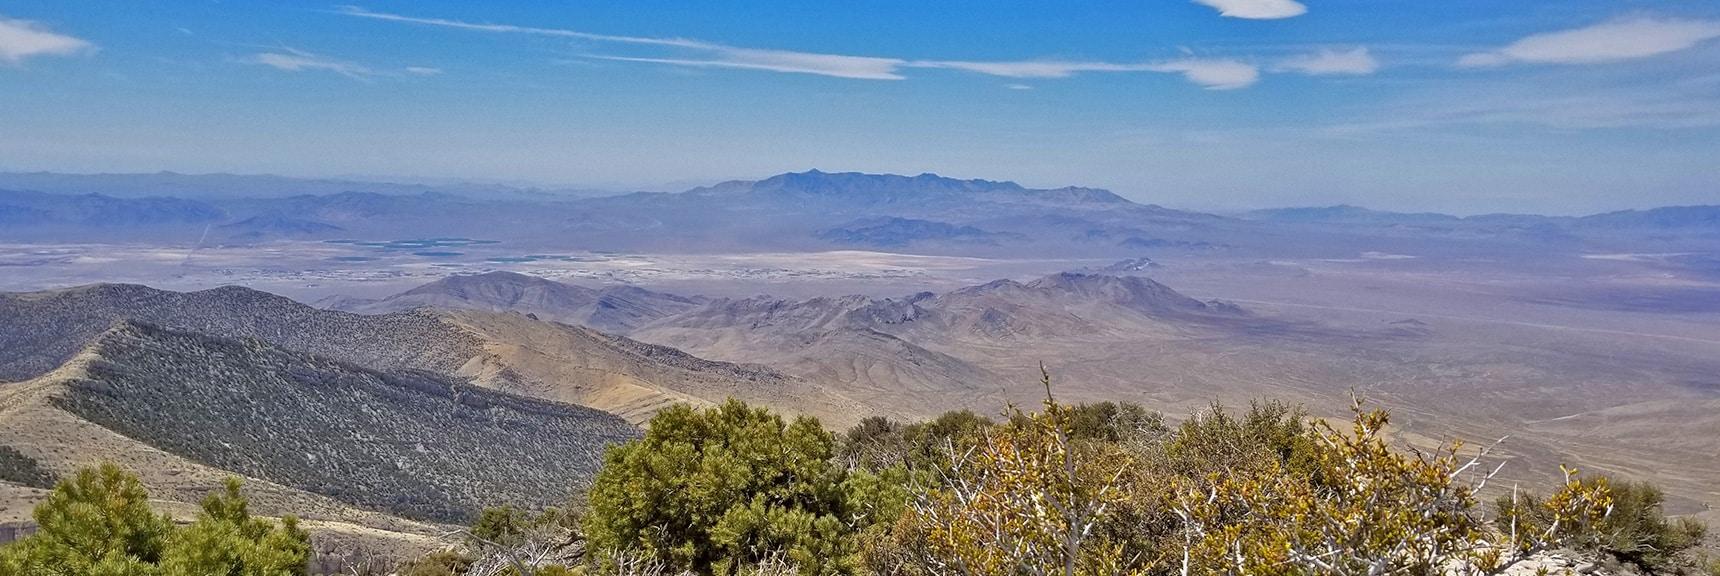 View Southeast from the South Summit | Potosi Mountain Spring Mountains Nevada